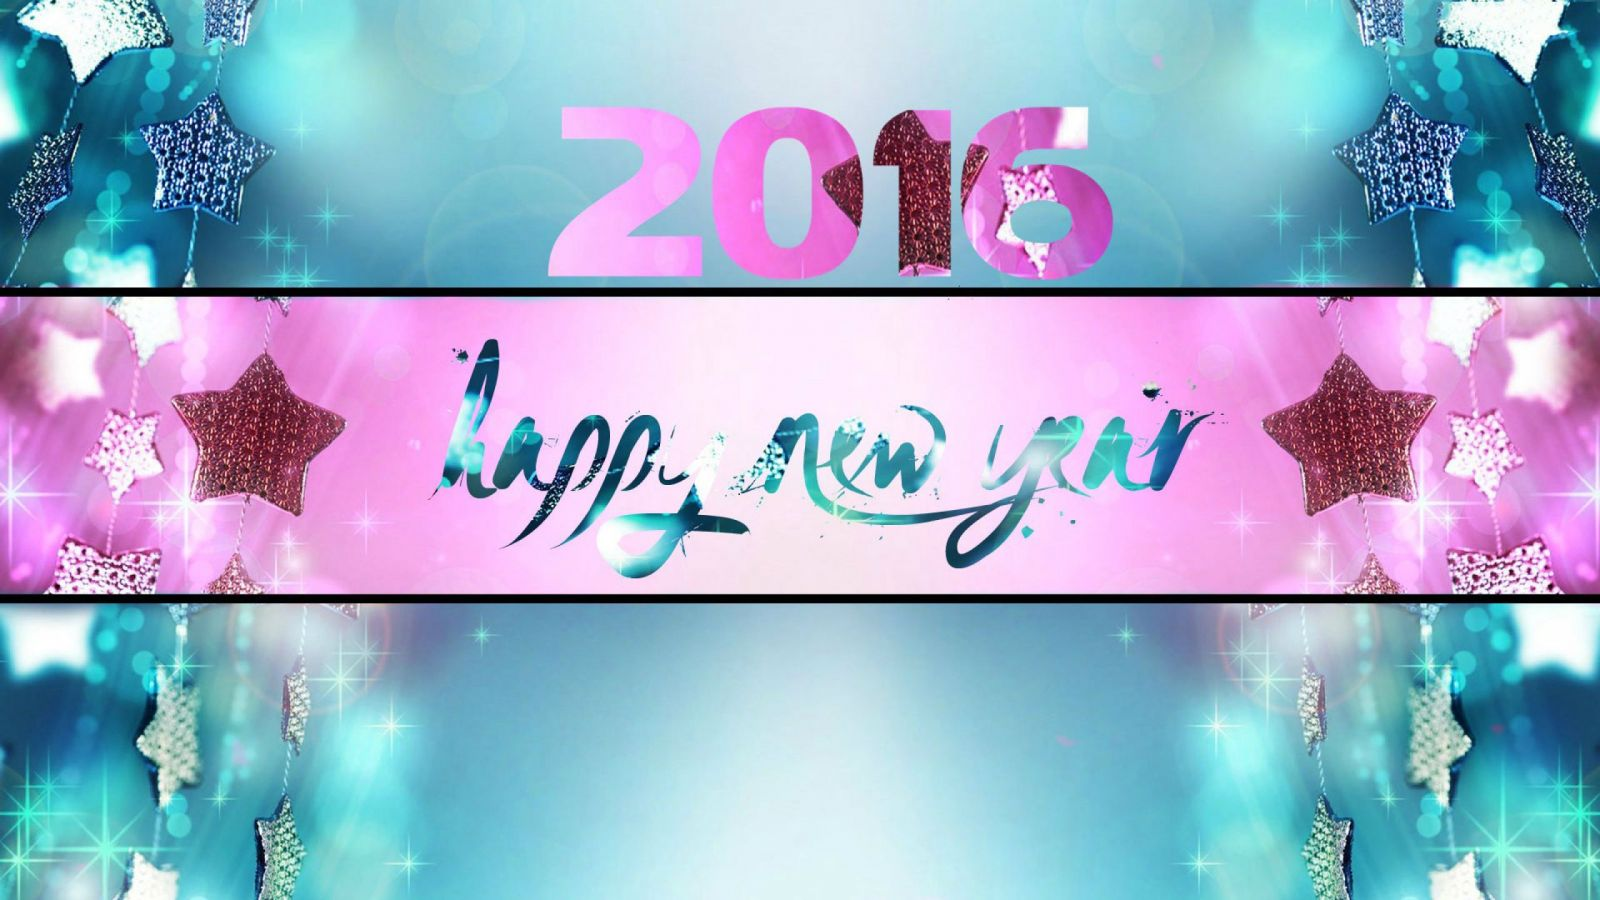 hinh-anh-tet-2016-xuan-2016-happy-new-year-2016-2